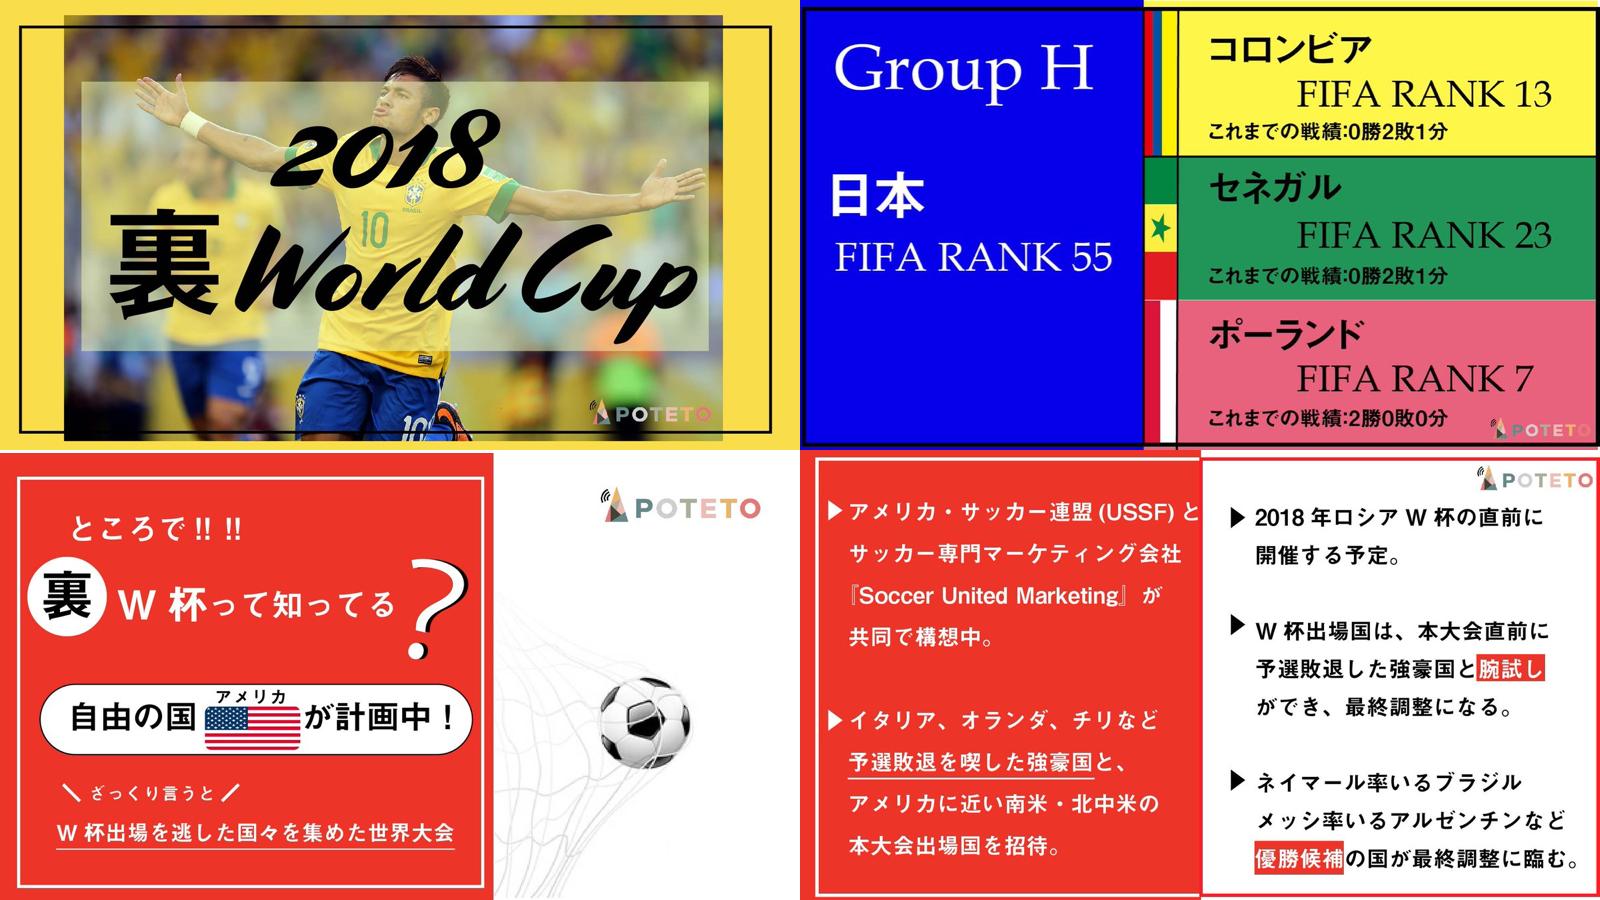 1802783db20269aba22a3ea93b92cabe - 裏ワールドカップ